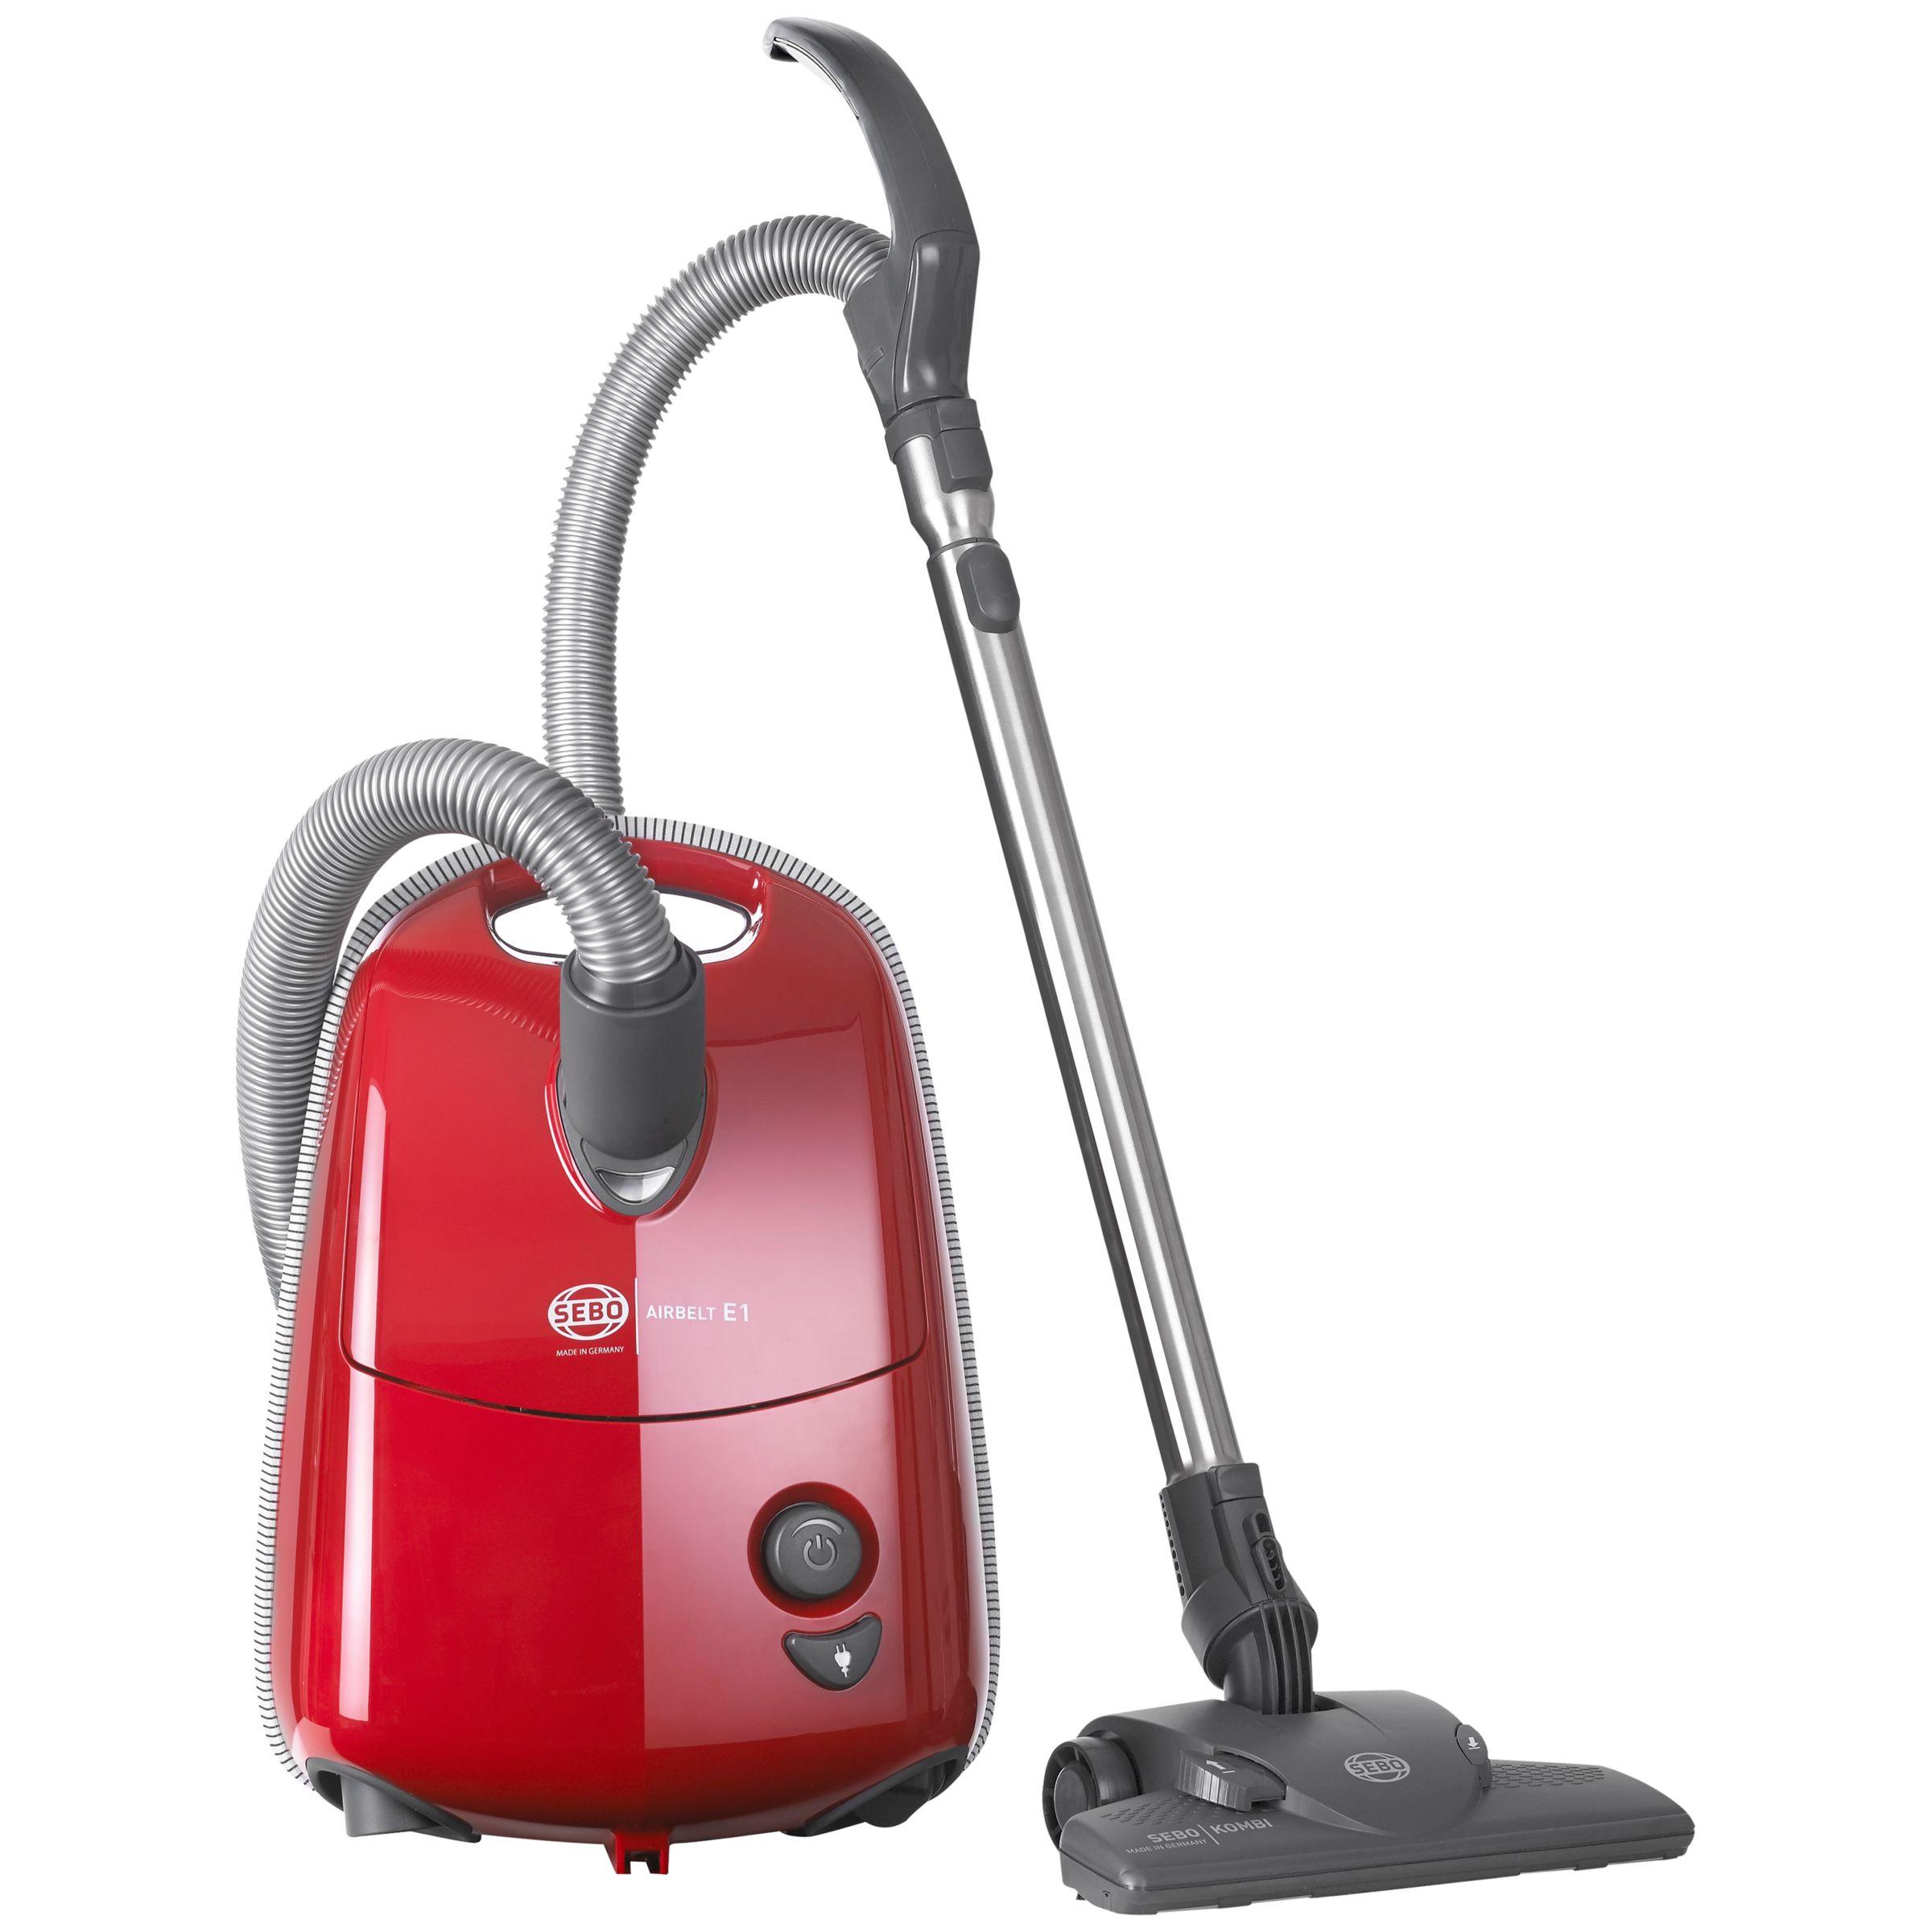 Sebo Sebo Airbelt E1 Cylinder Vacuum Cleaner